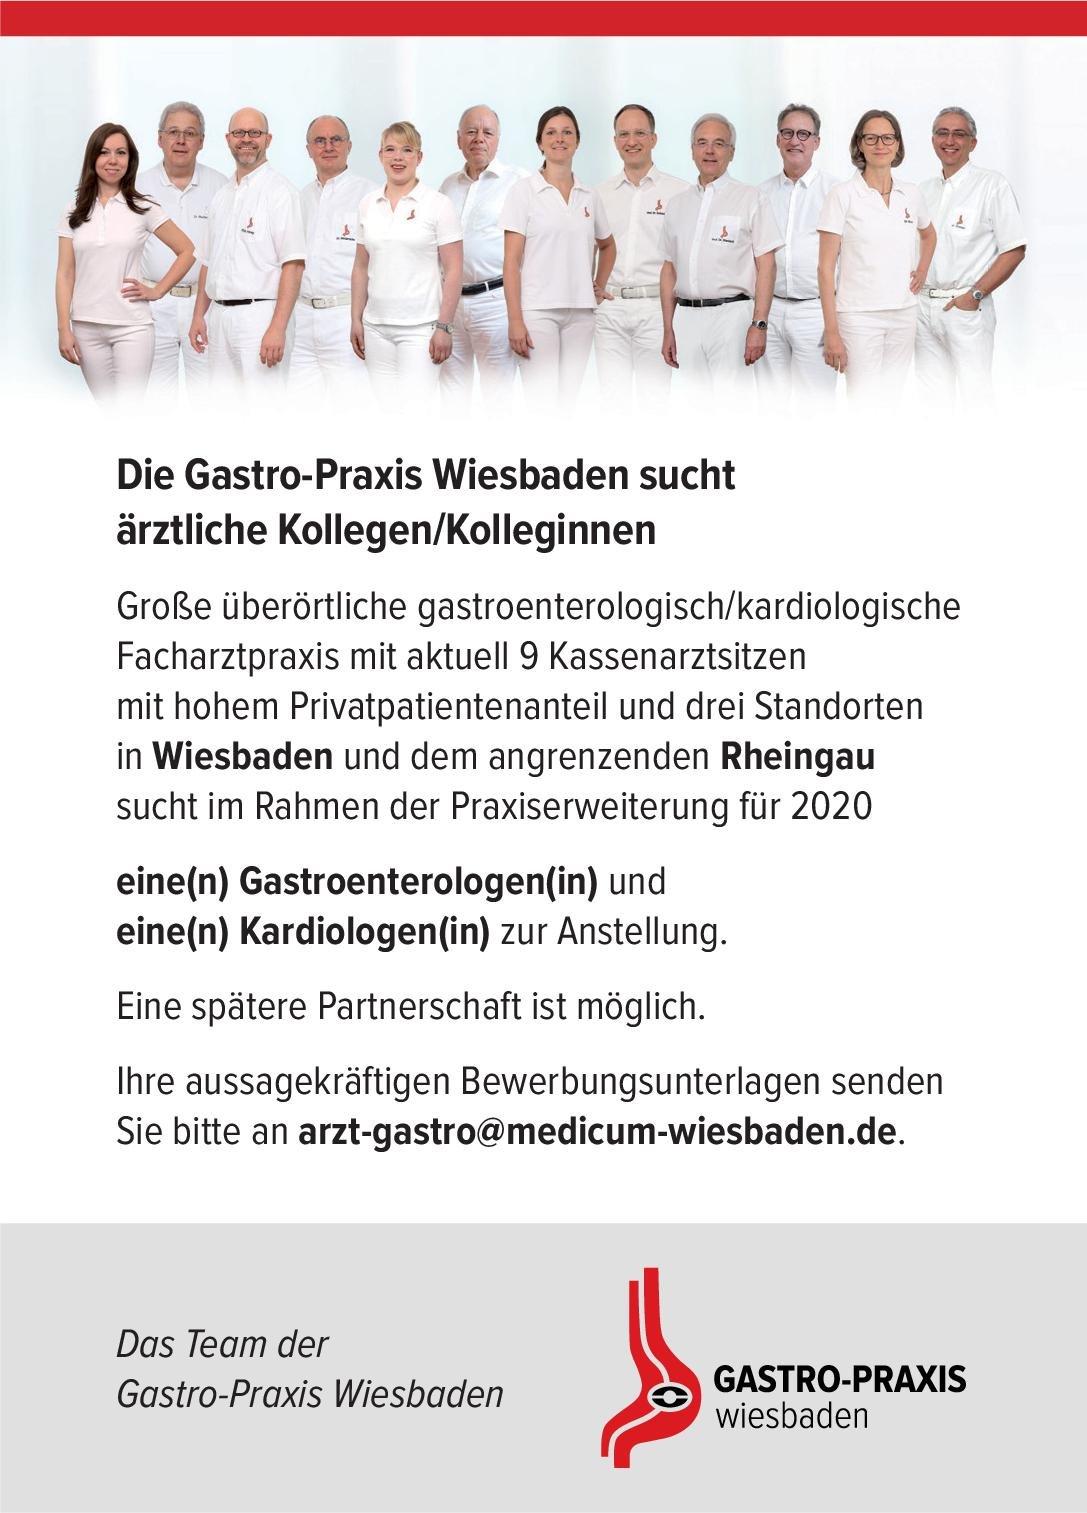 Gastro-Praxis Gastroenterologen(in)  Innere Medizin und Gastroenterologie, Innere Medizin Arzt / Facharzt